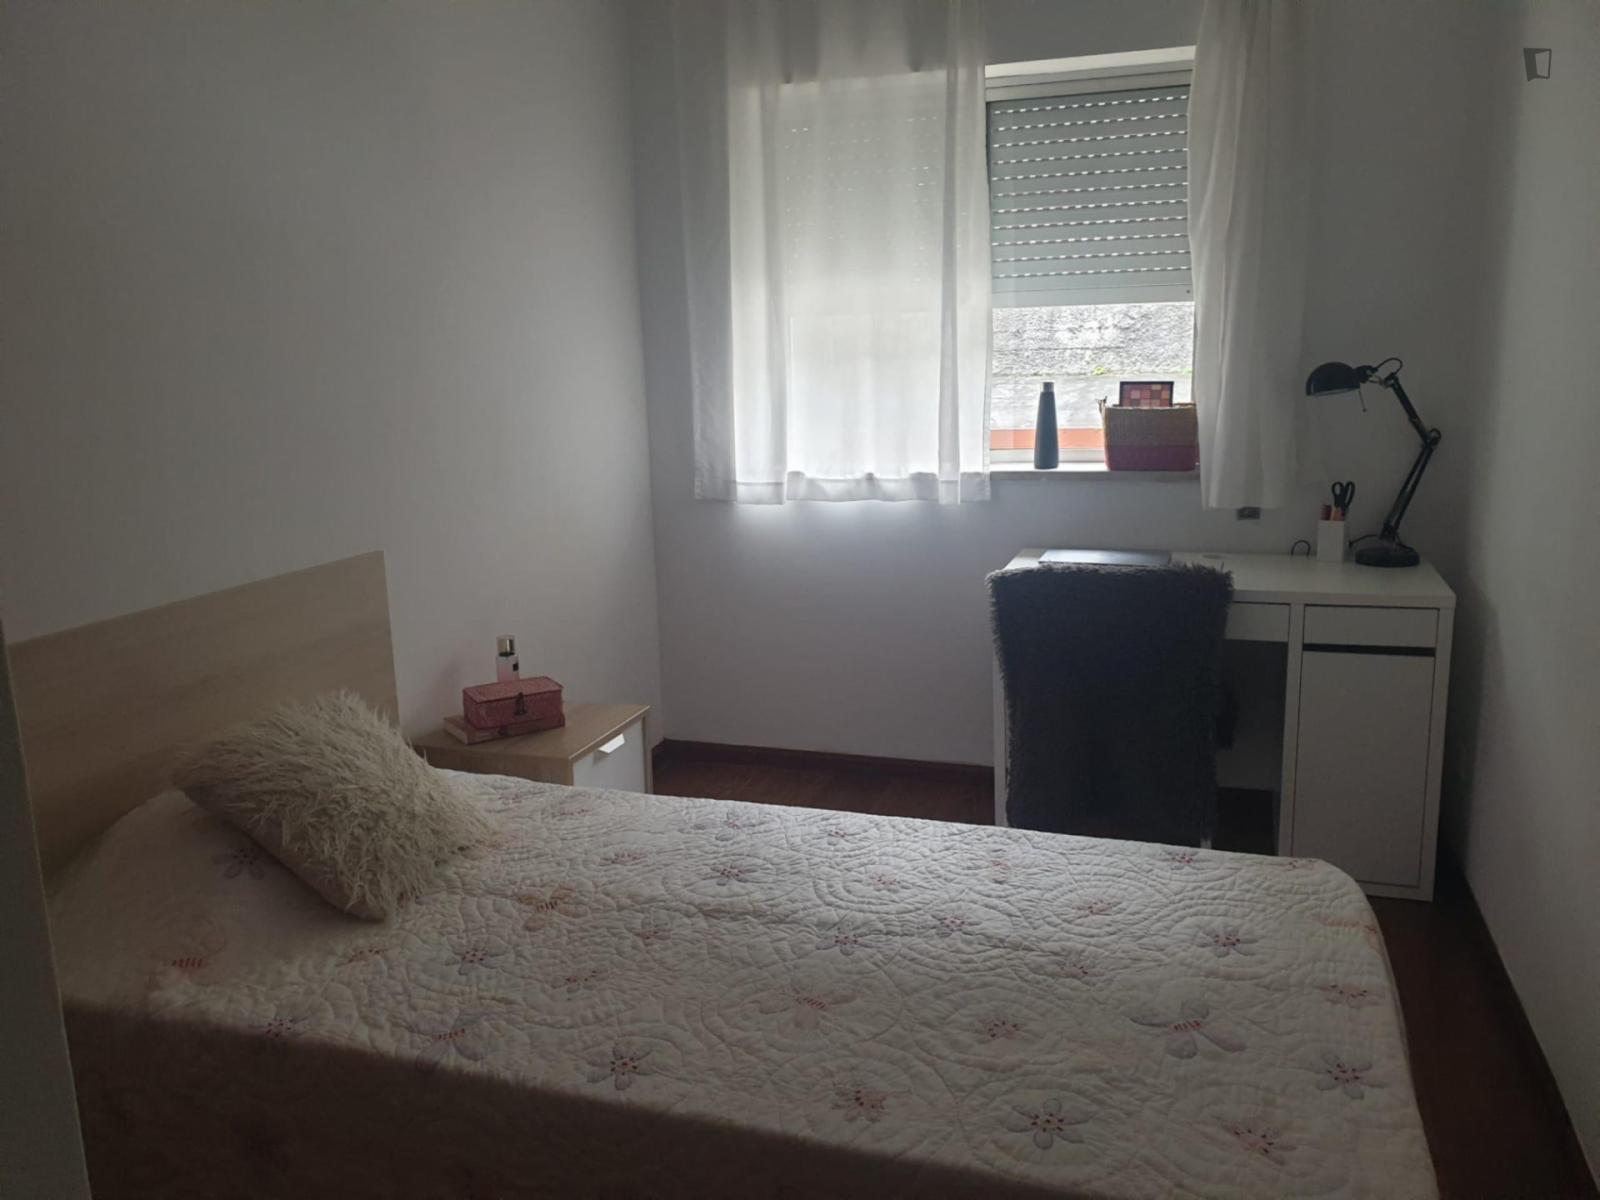 Avenida Mendes Silva - 220EUR / month